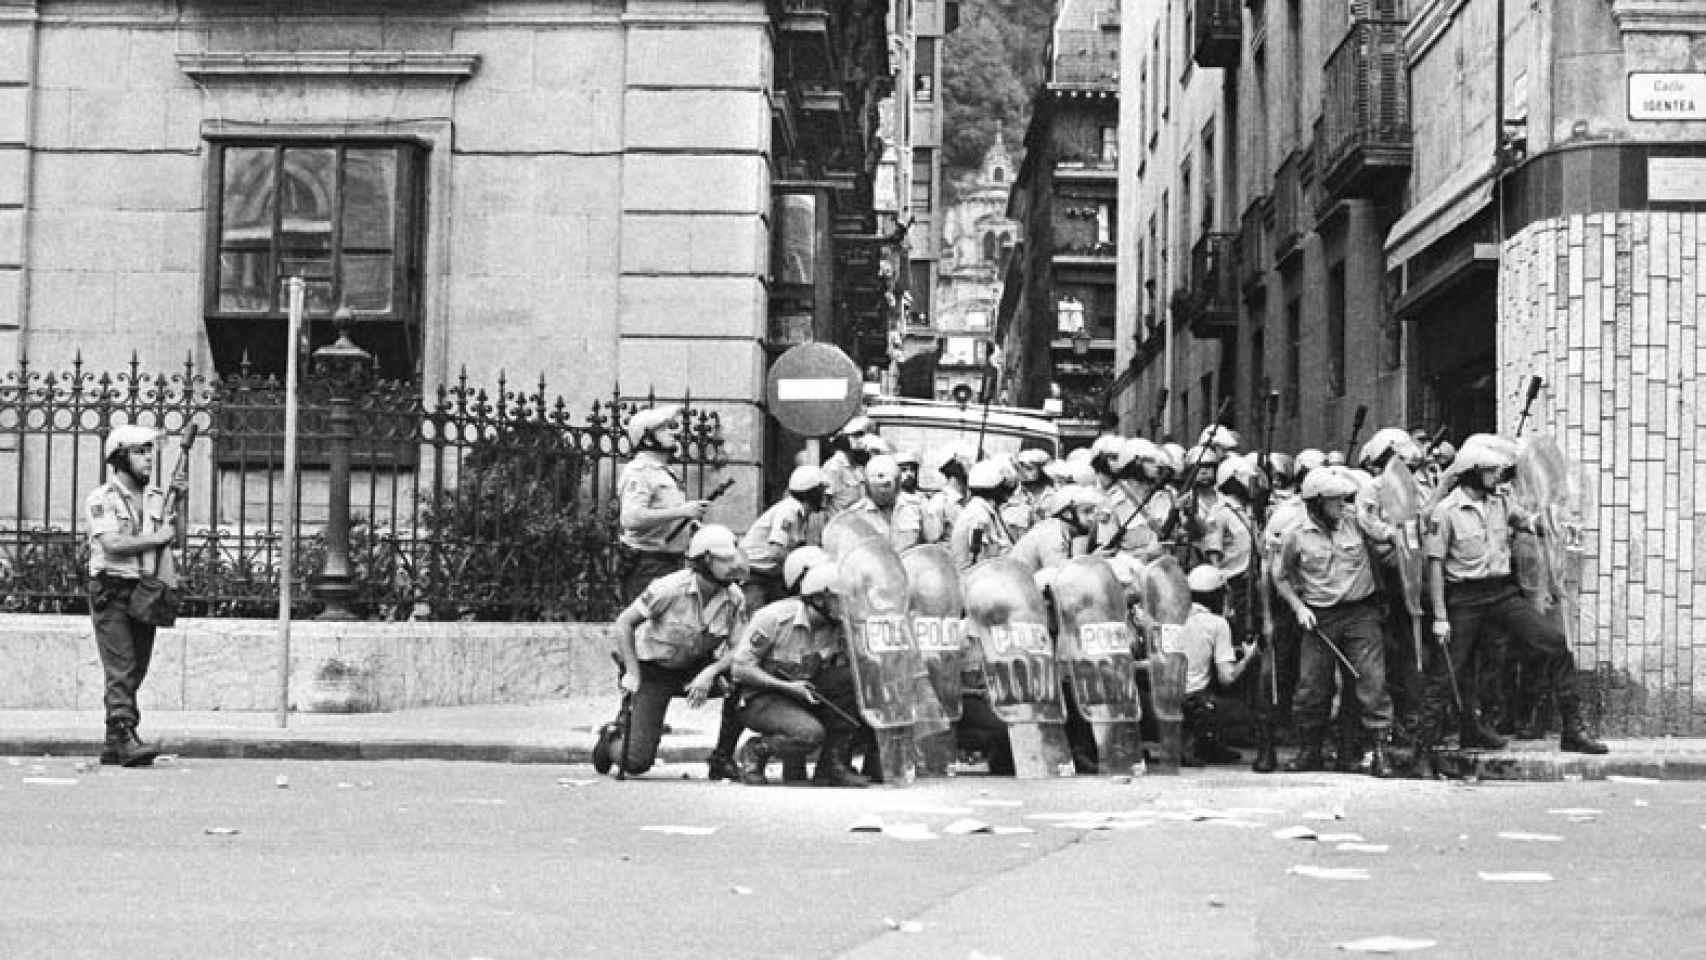 La obra del fotoperiodista Clemente Bernard es analizada por Edurne Portela.